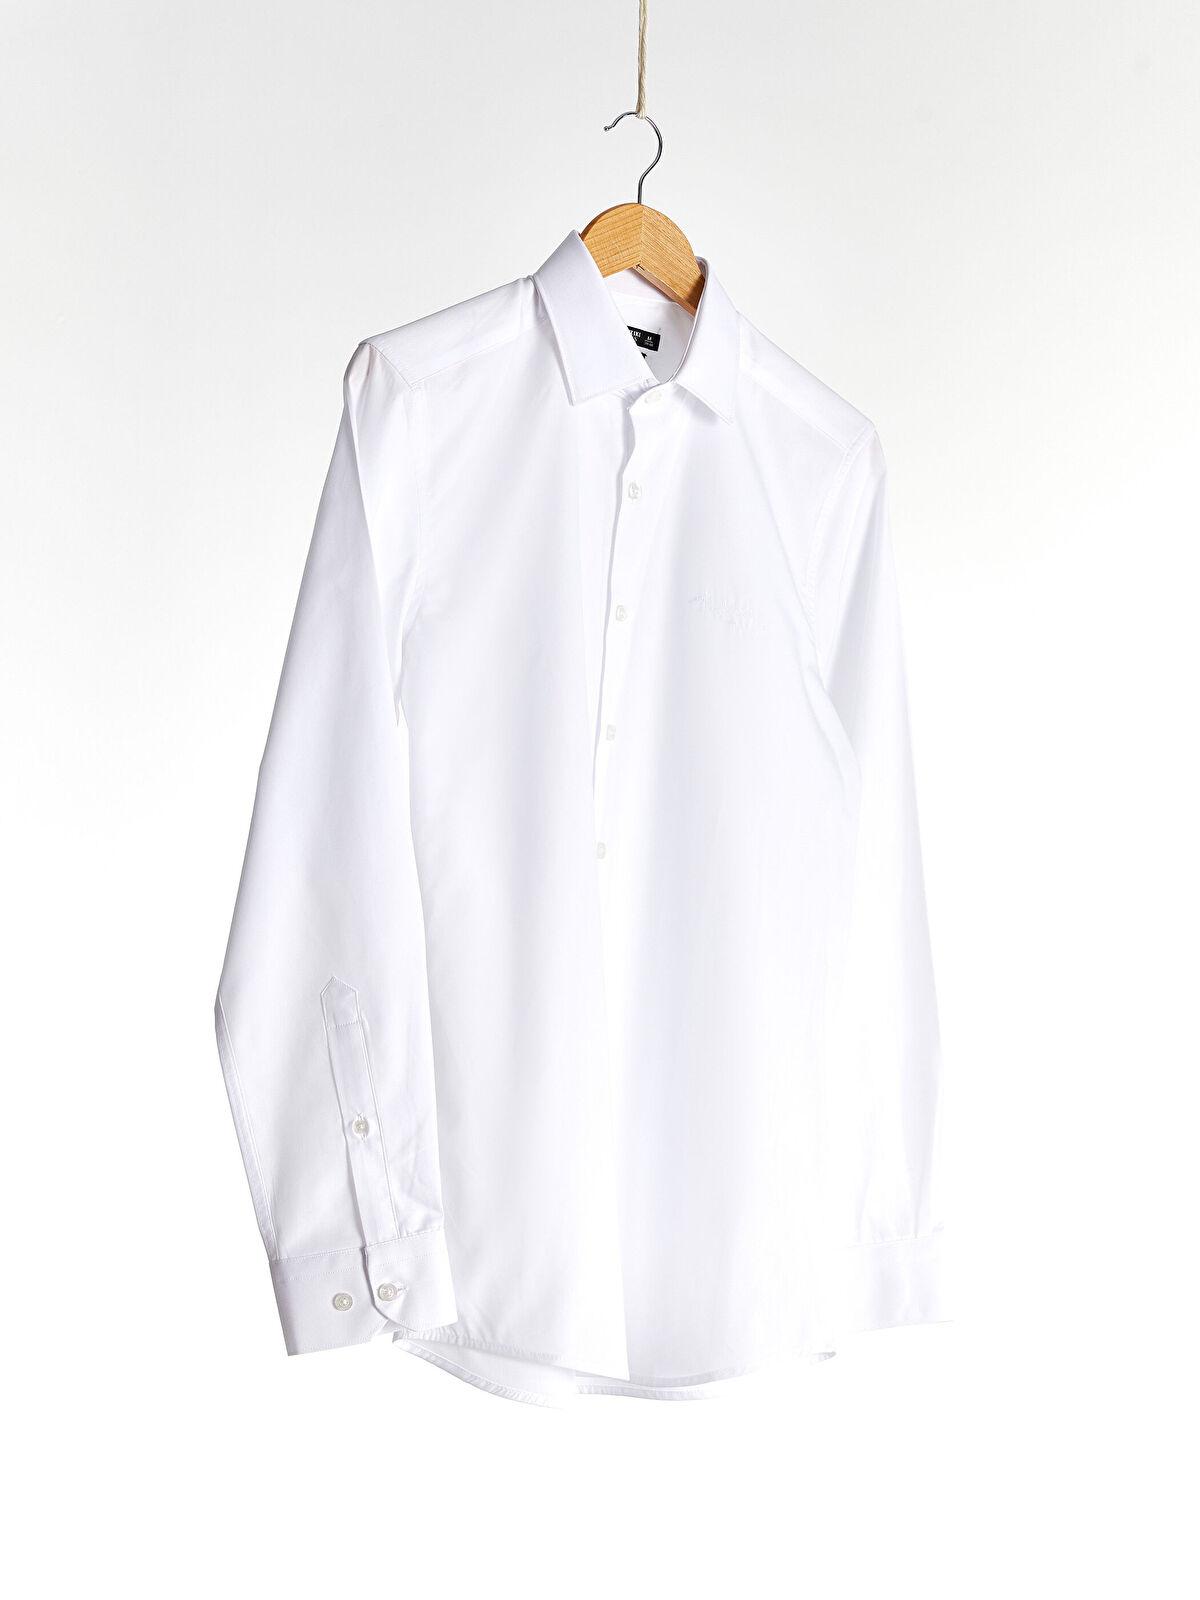 K.Atatürk İmza Nakışlı Slim Fit Gömlek - LC WAIKIKI